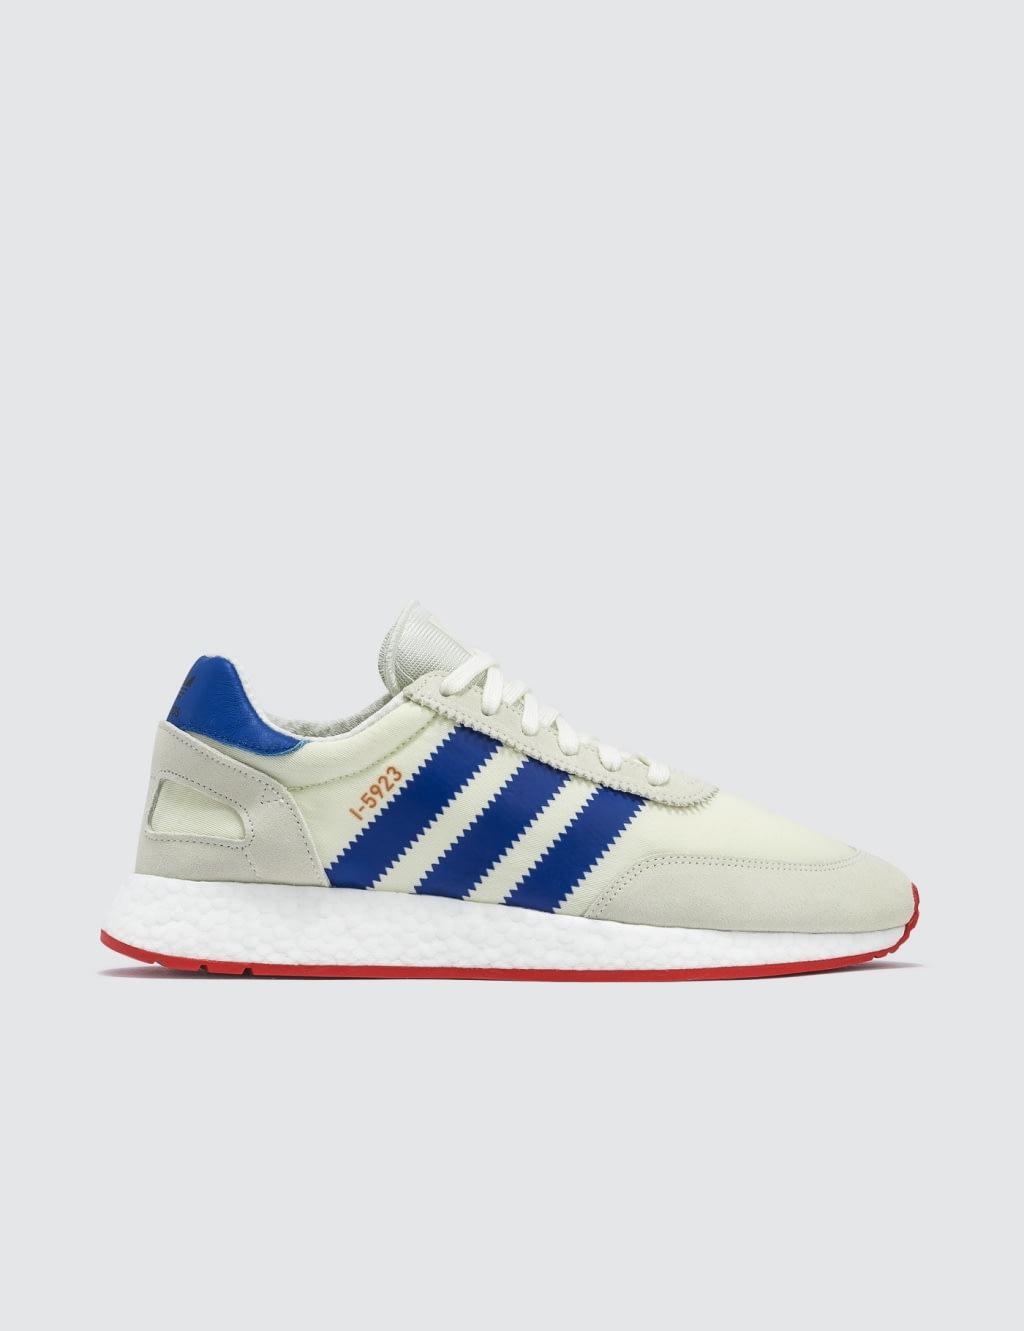 Originaux Adidas Adidas I-5923 Chaussures De Sport - Noir LrNTk